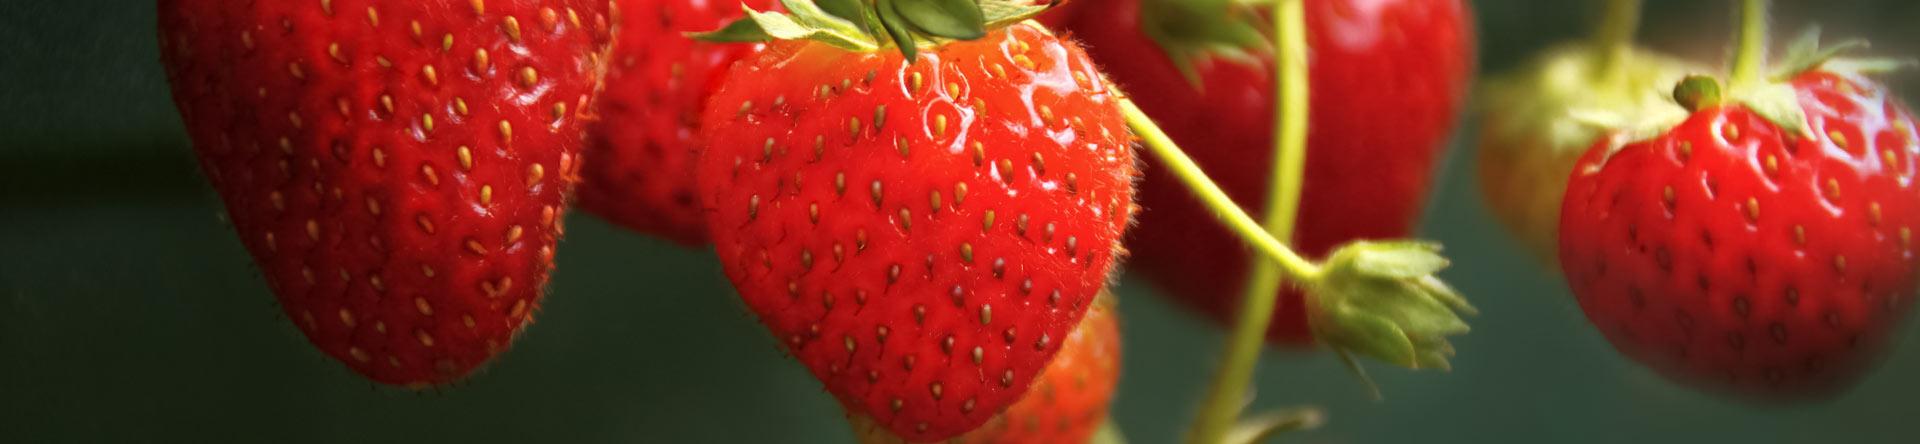 fresas, frecas, fruta, fotografia gastronomica, fotografia publicitaria, fotografia producto, fotografia profesional, Alicante